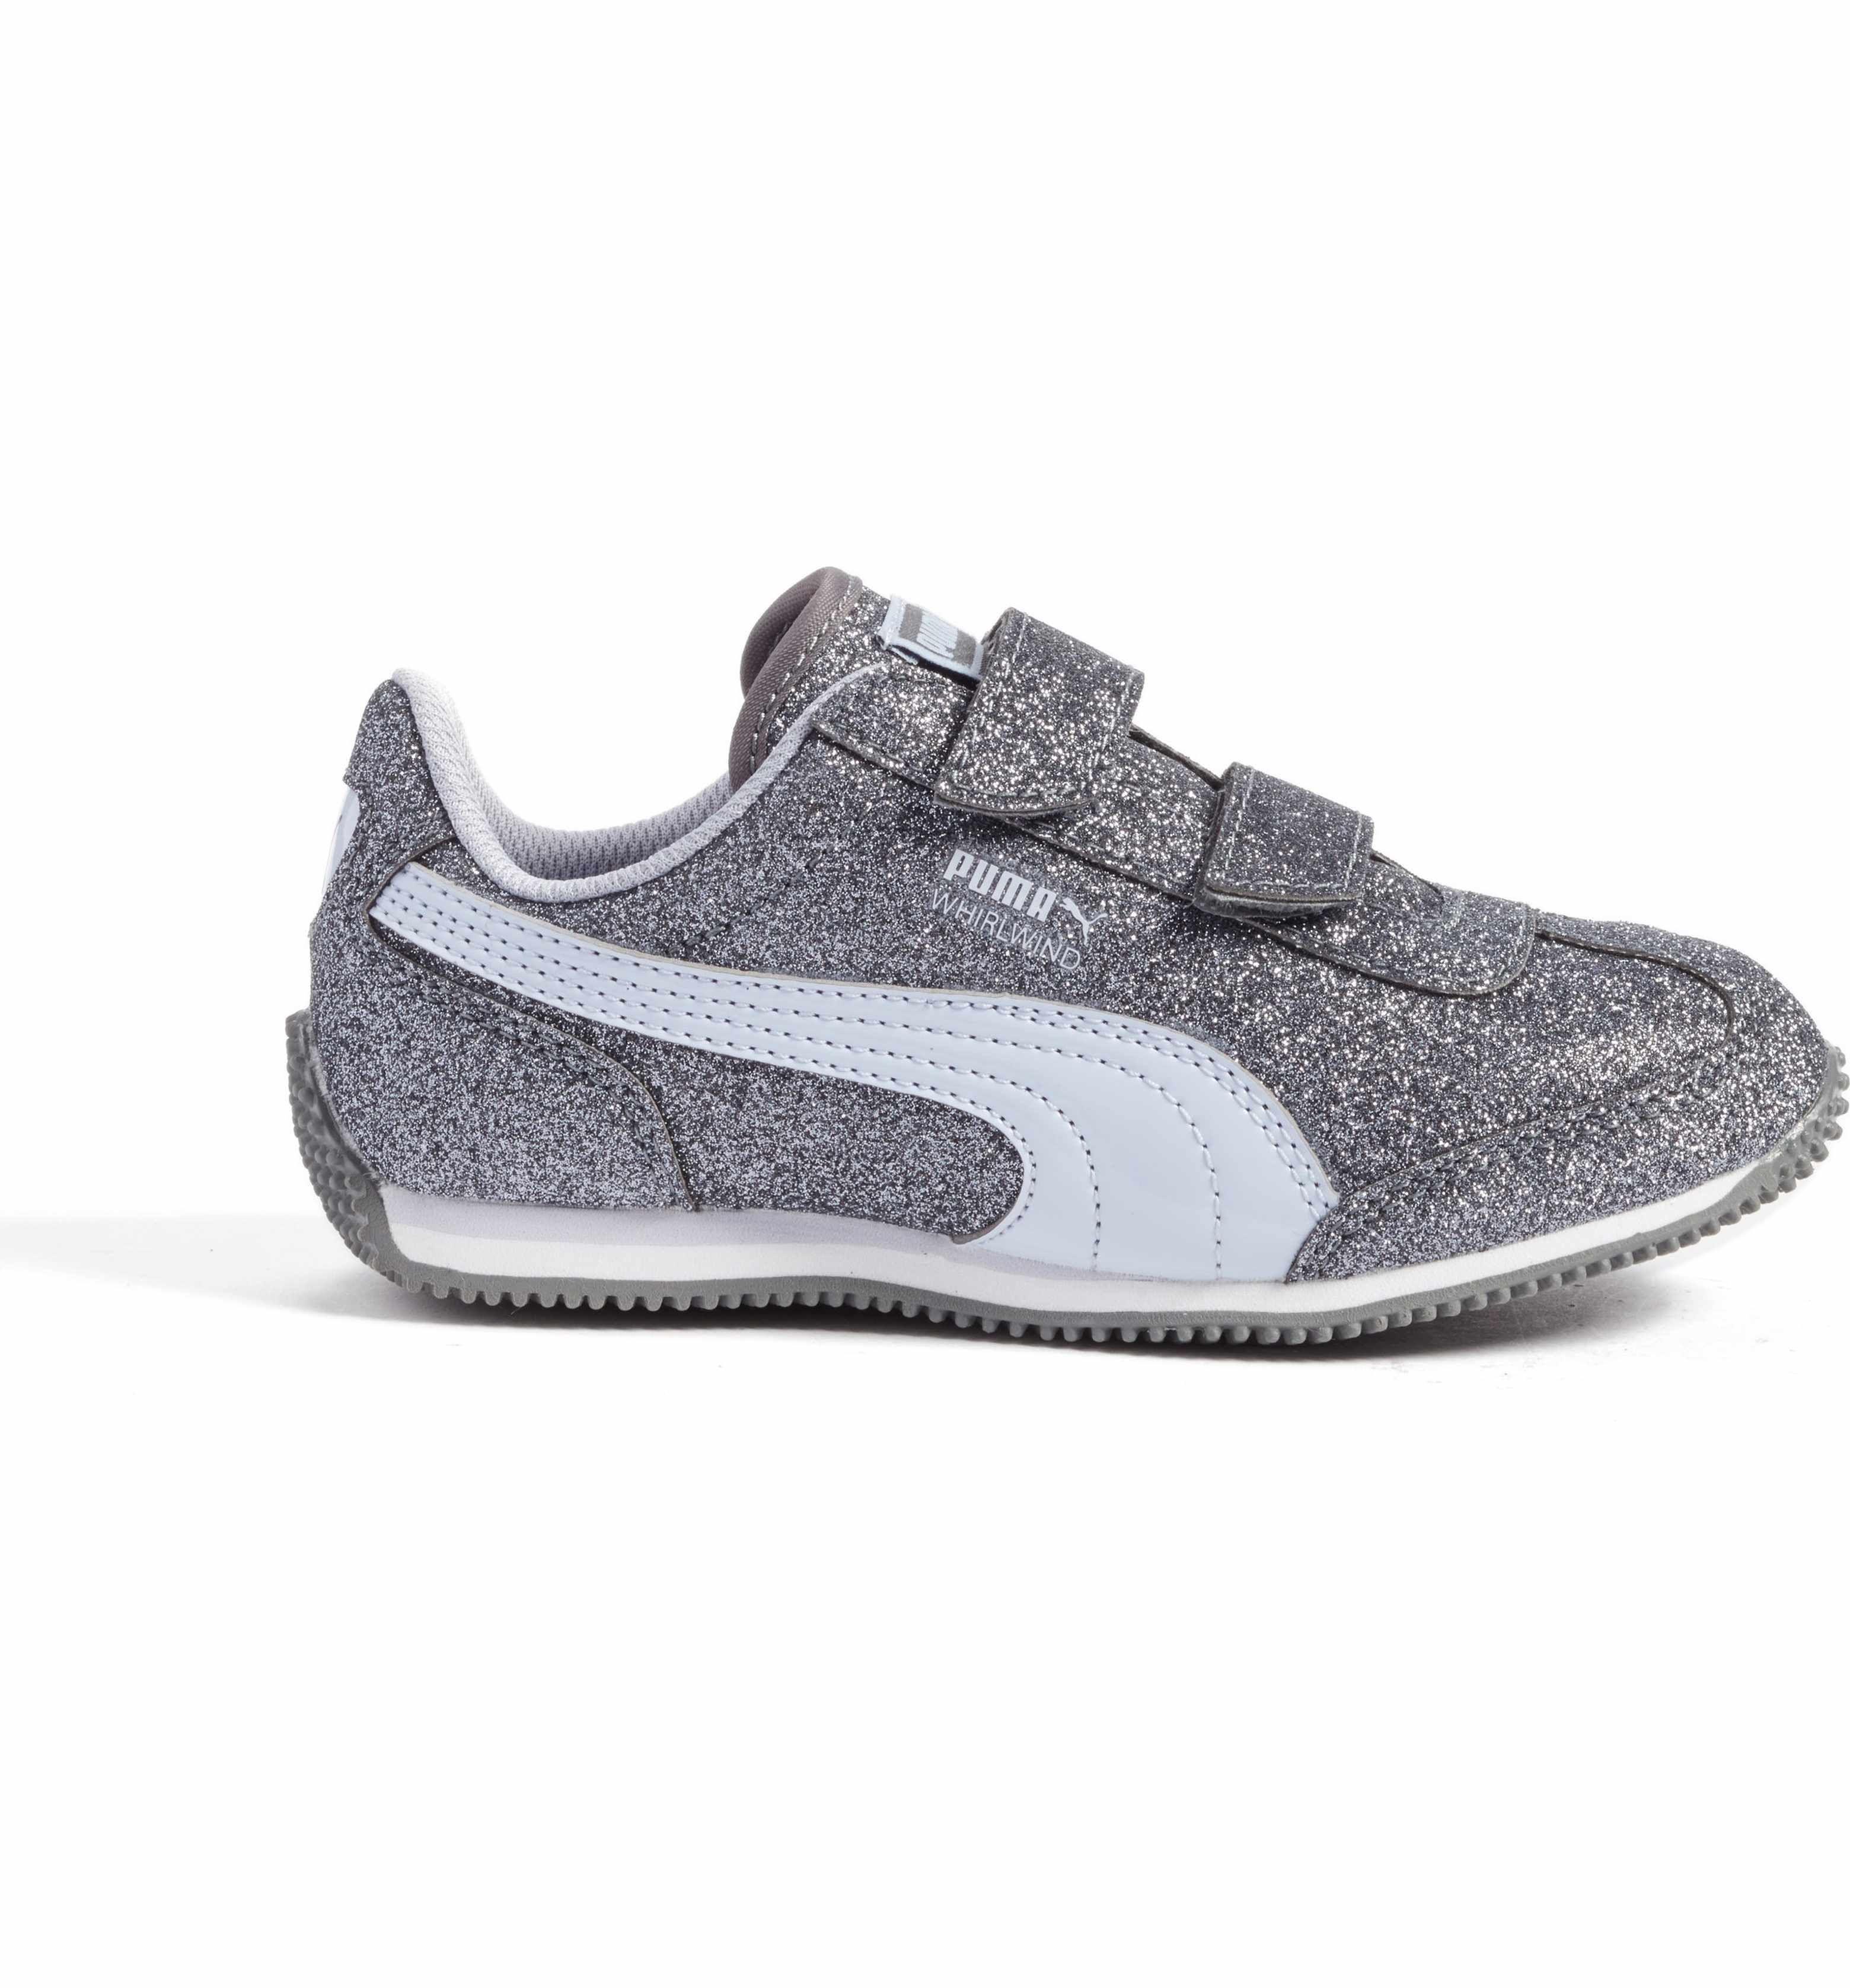 Toddler) | Baby sneakers, Sneakers